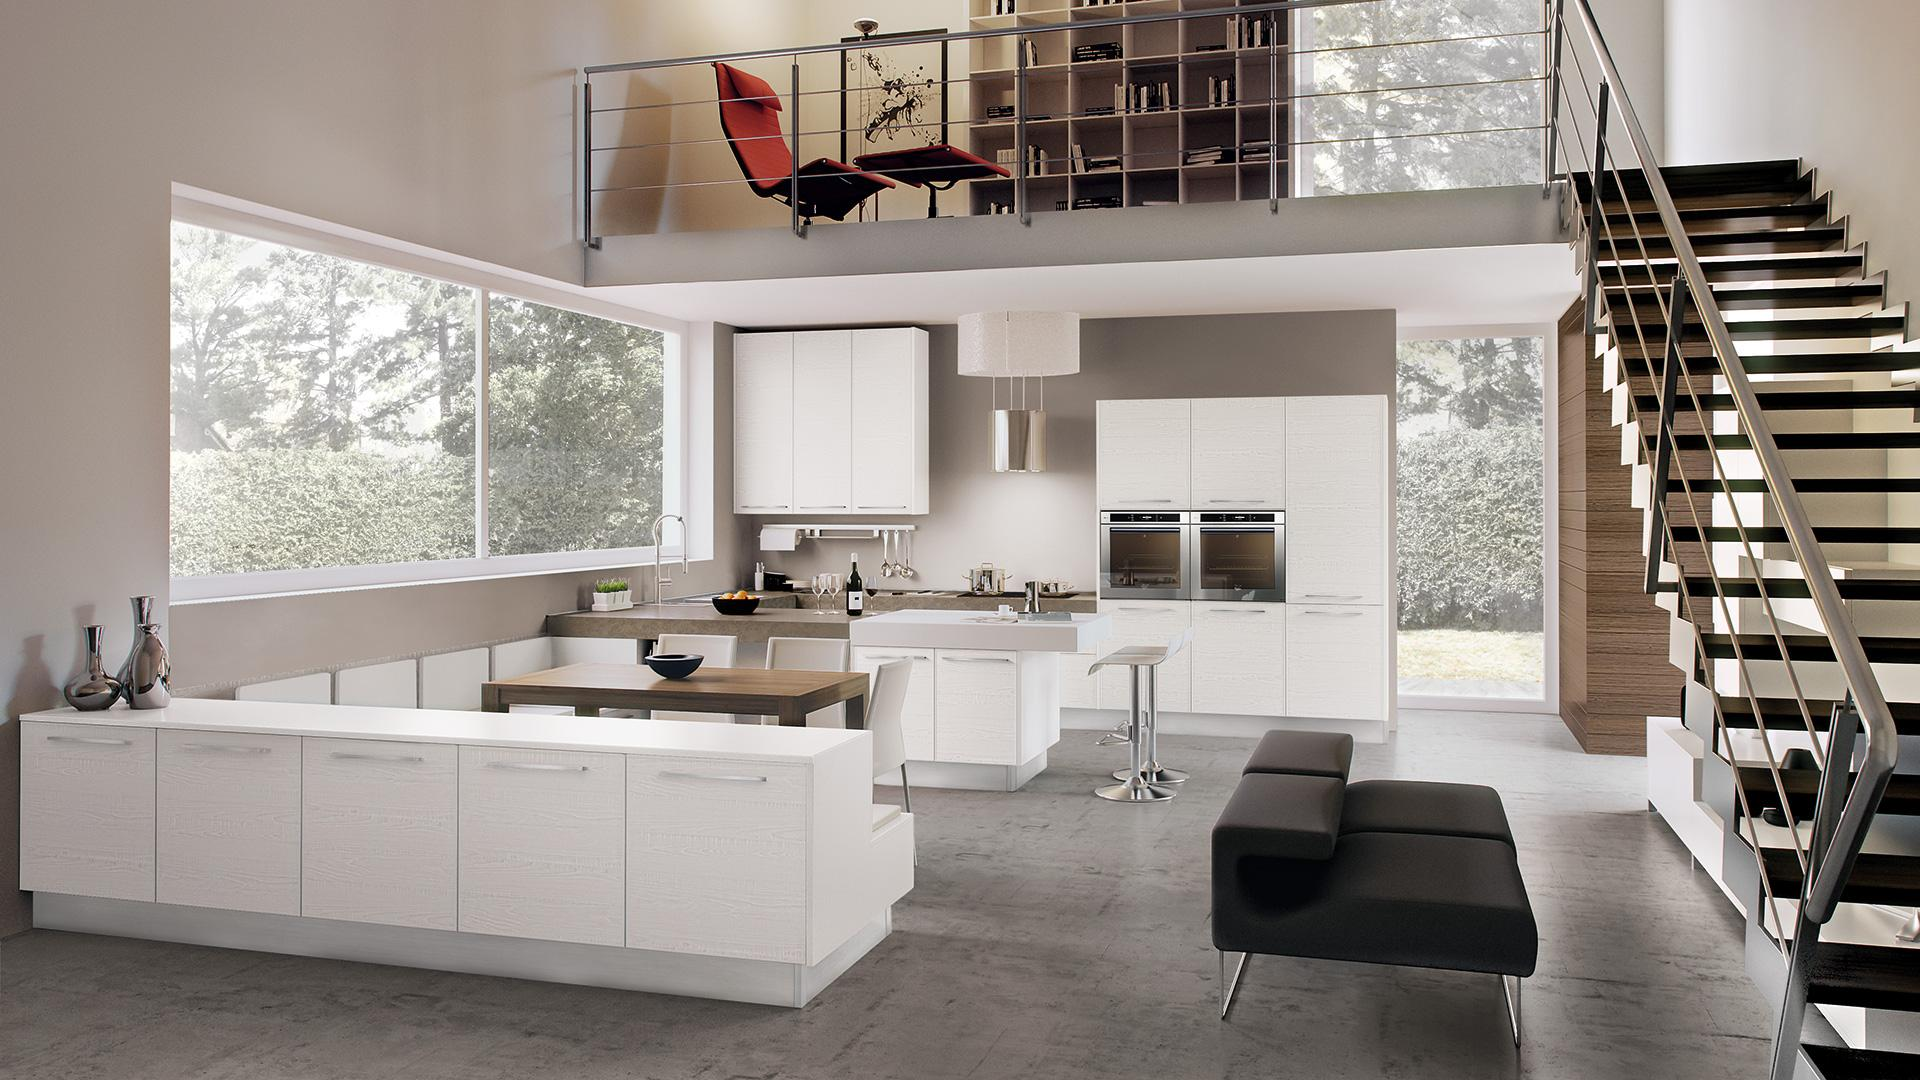 Perché scegliere una cucina bianca - Cucine Lube Milano